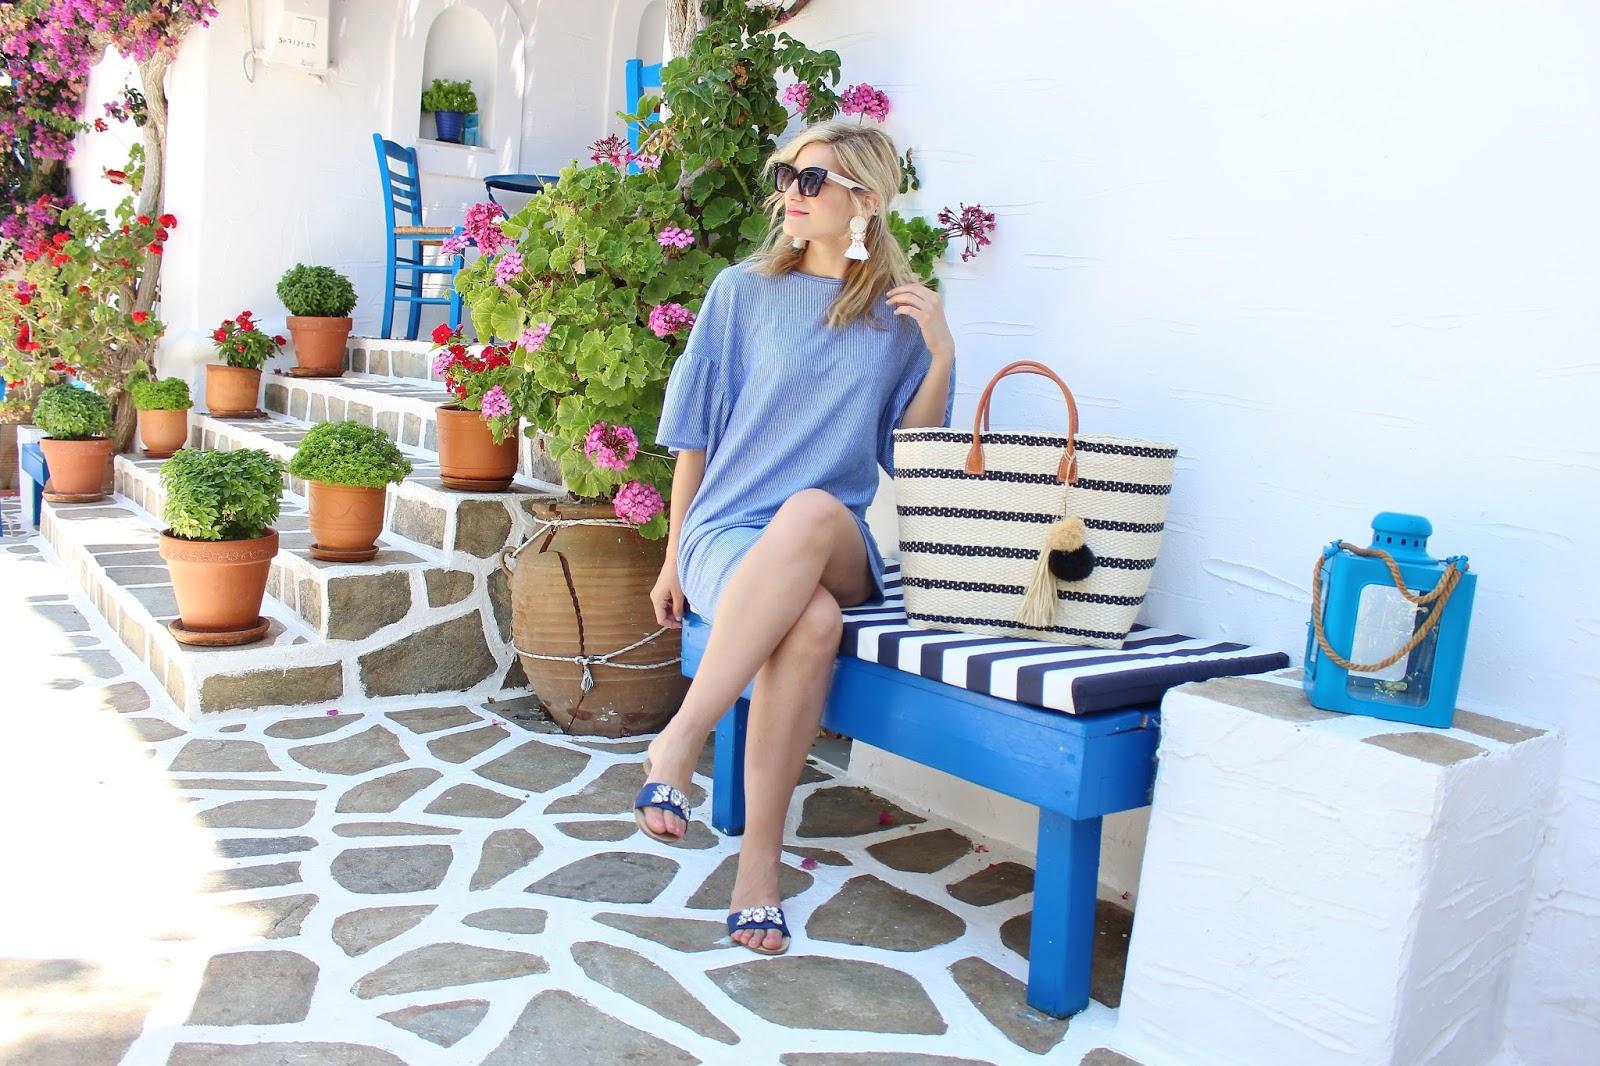 bijuleni, summer accessory essential